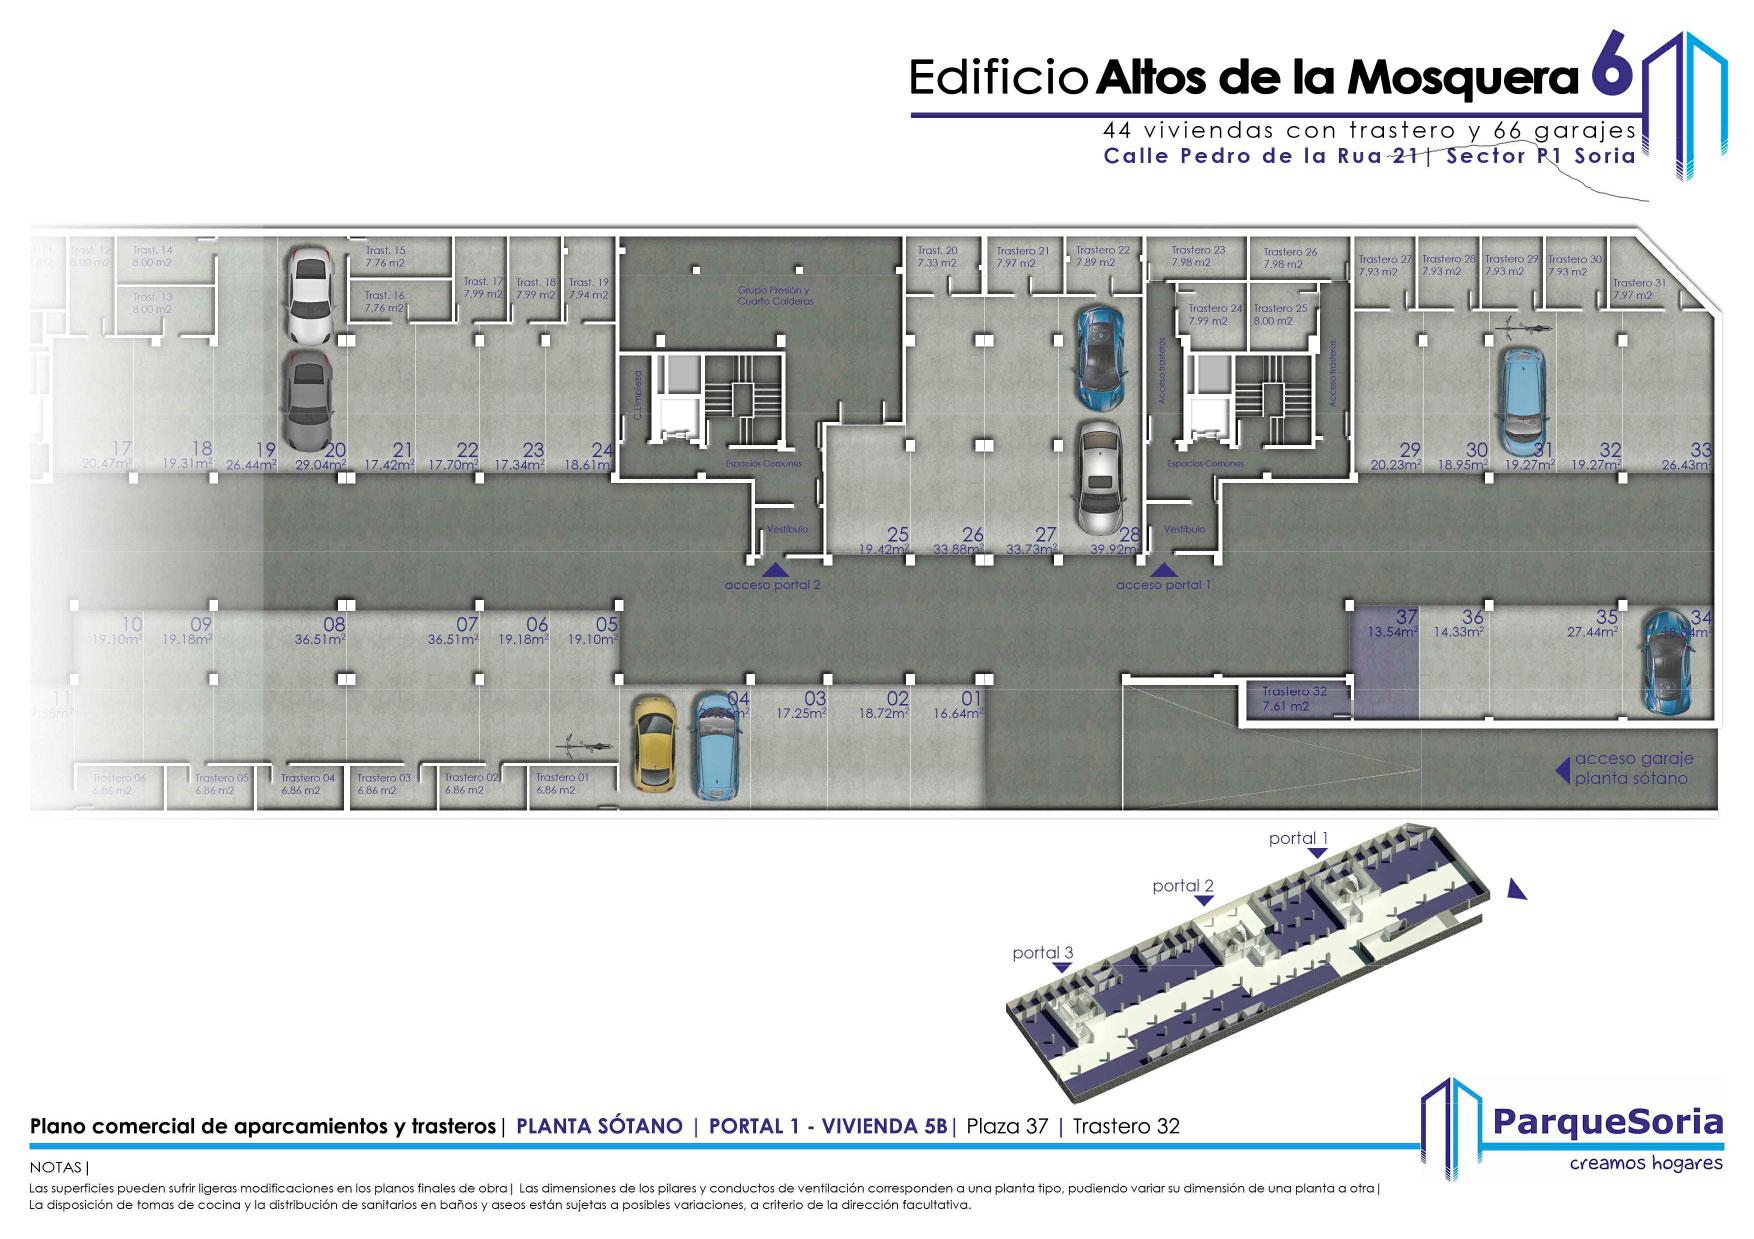 Parquesoria-Altos-de-la-mosquera-6-5B-3